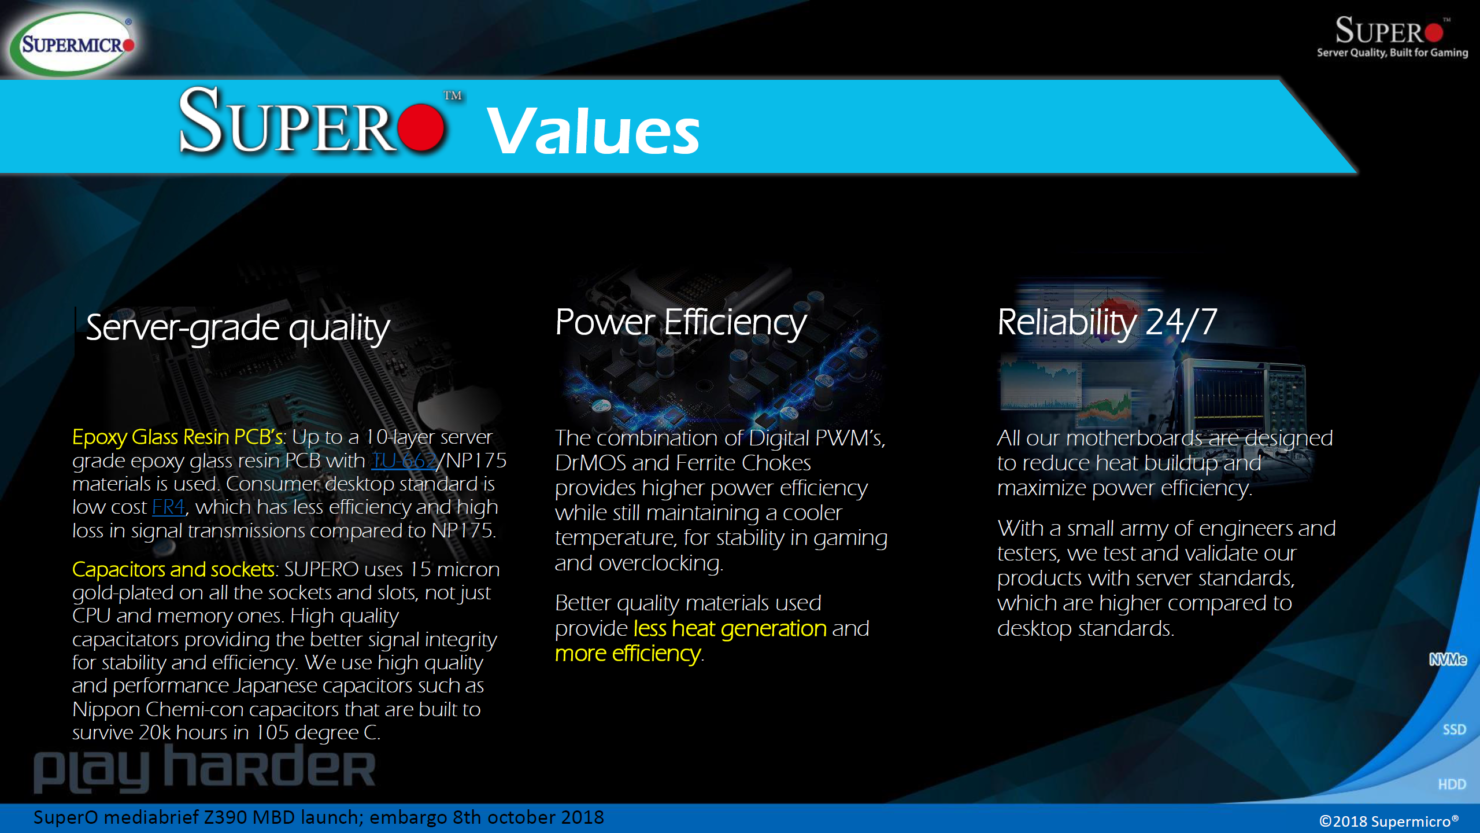 supermicro-supero-z390-motherboards_2